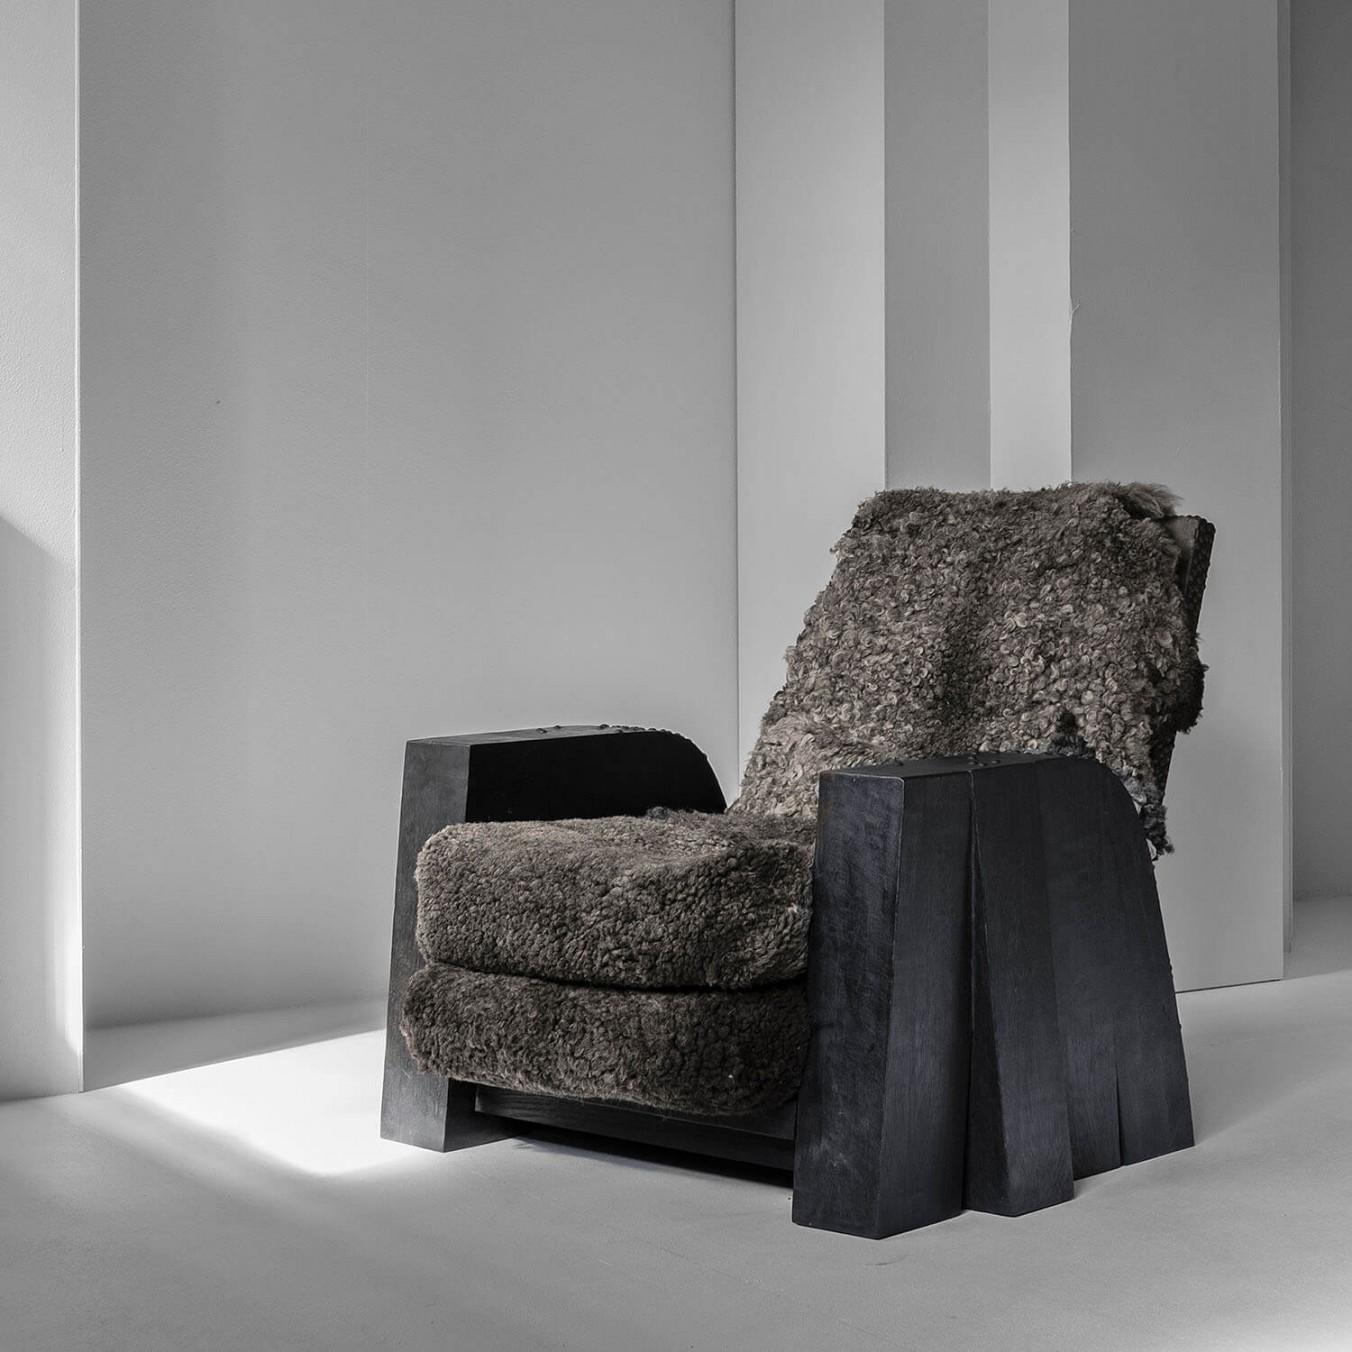 Animal Arm Chair (edition of 12)